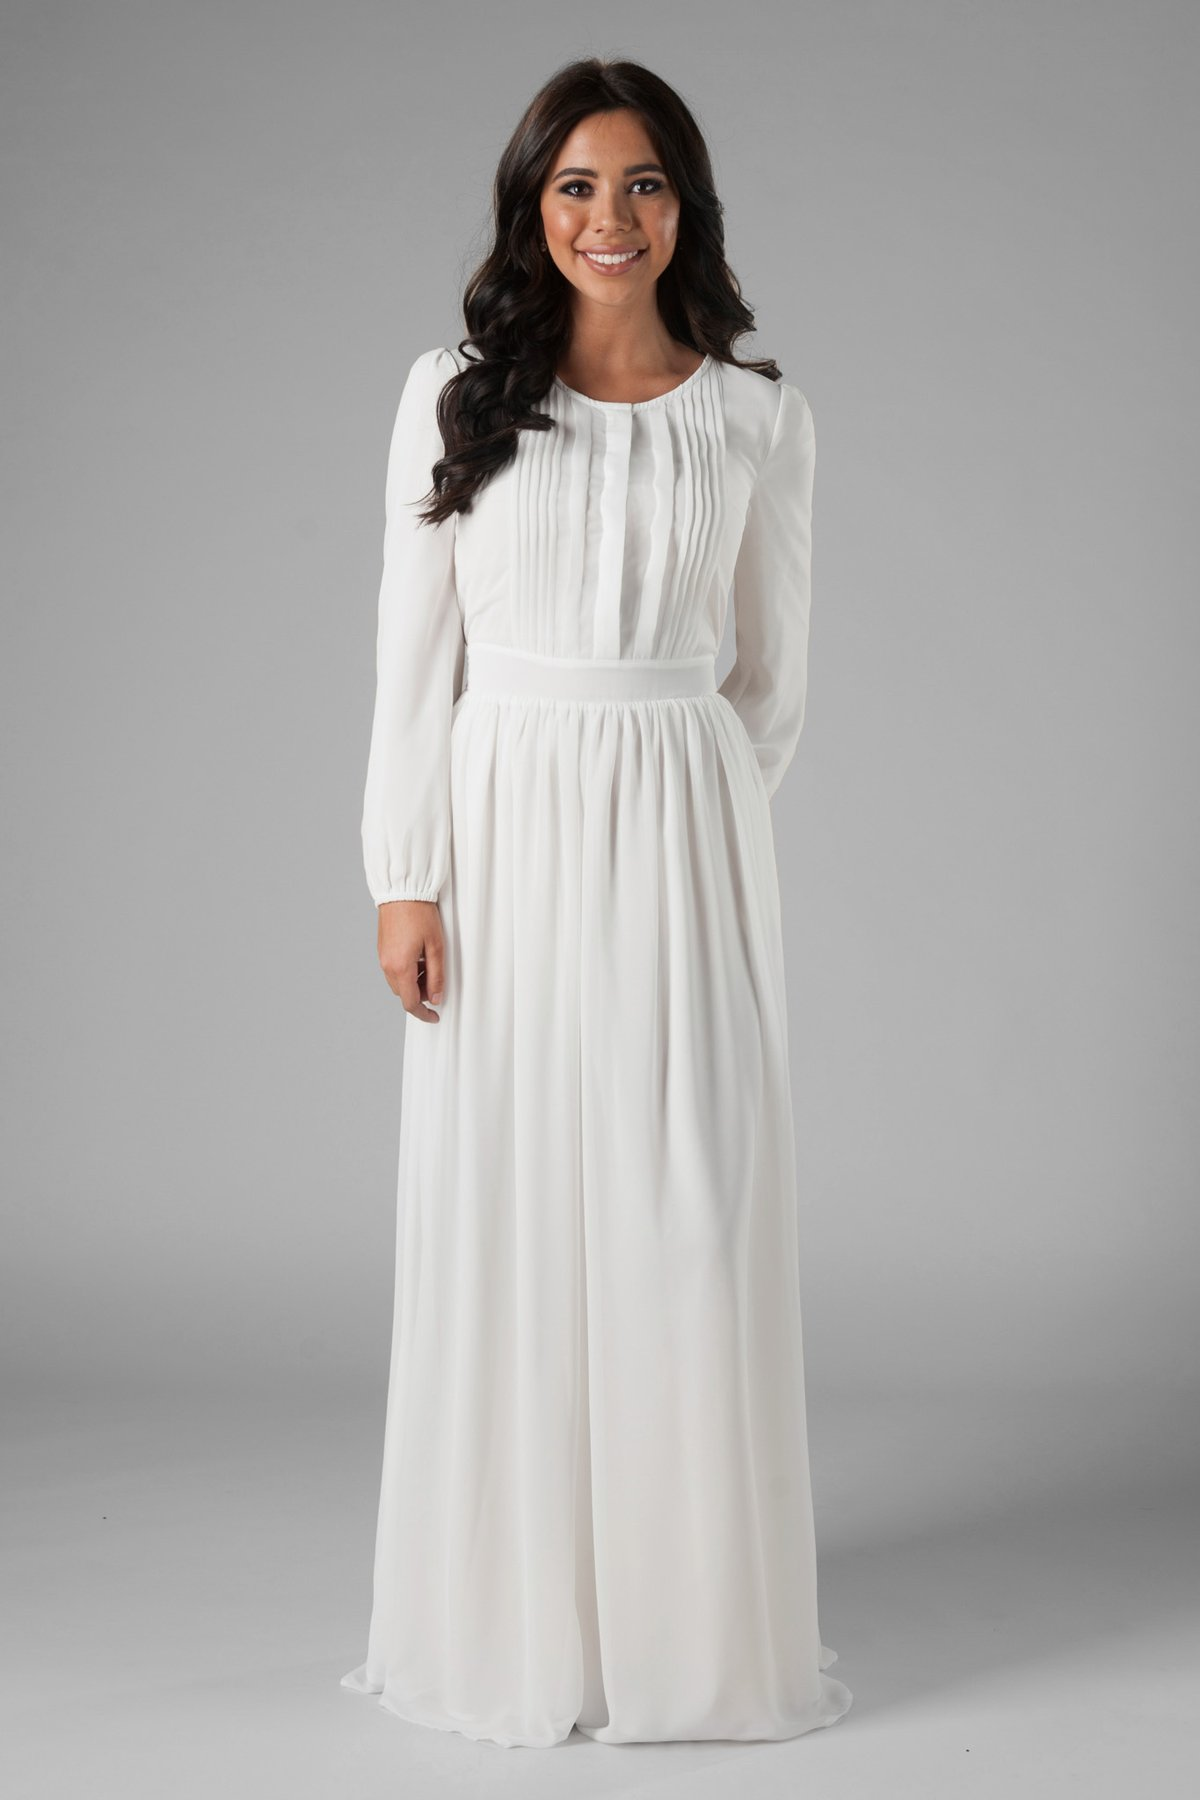 #2 Temple Dress